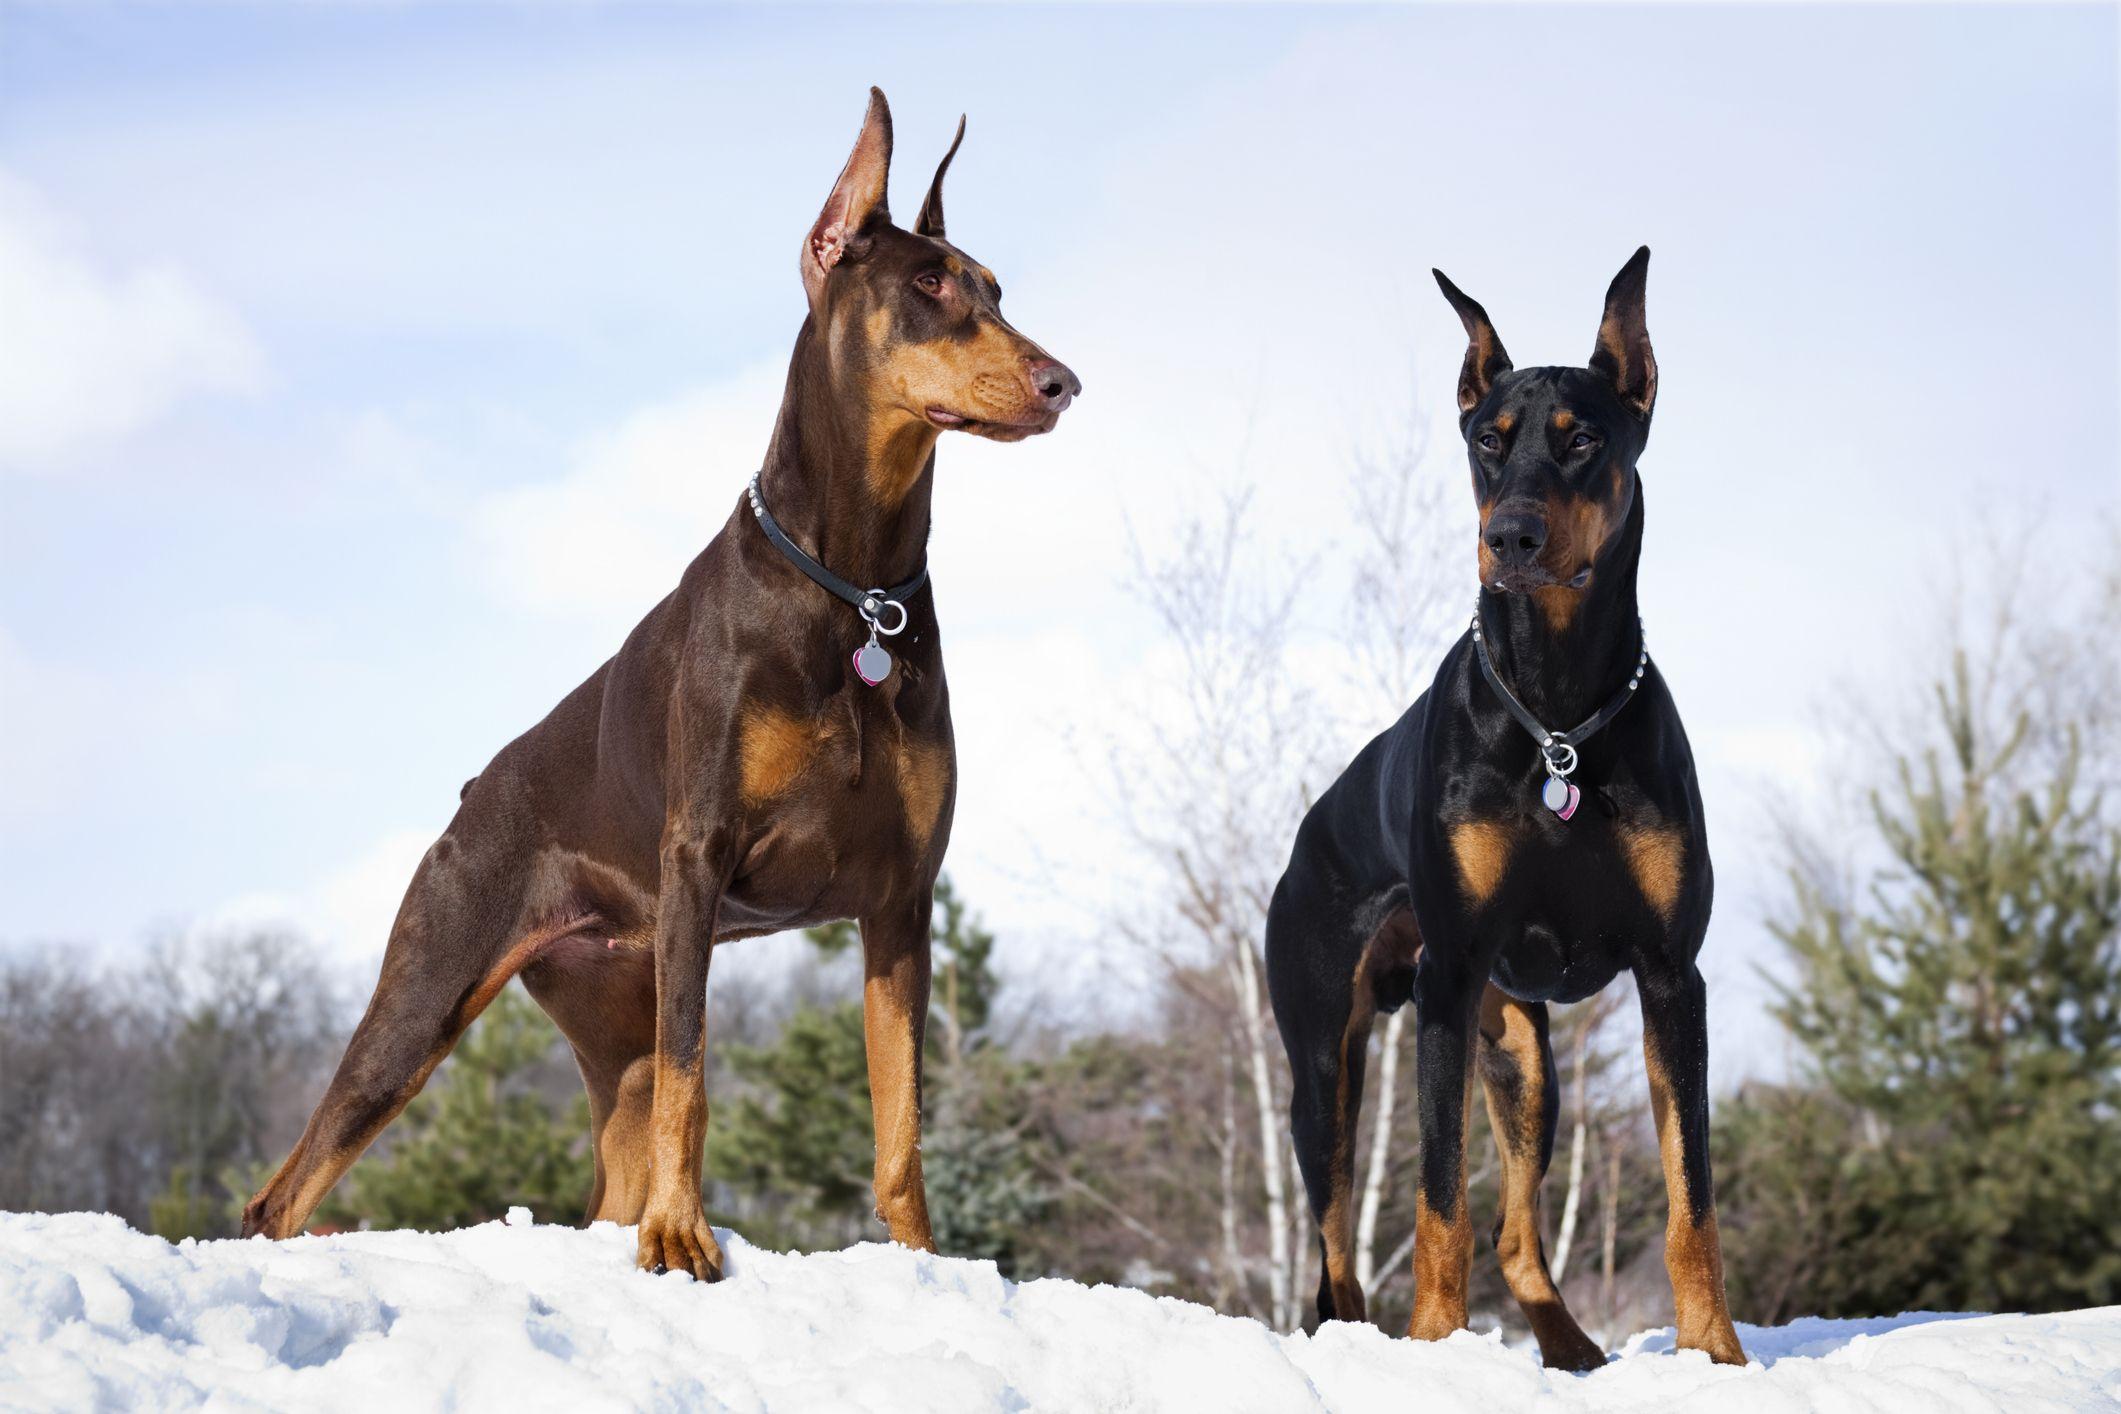 45 Best Large Dog Breeds - Top Big Dogs